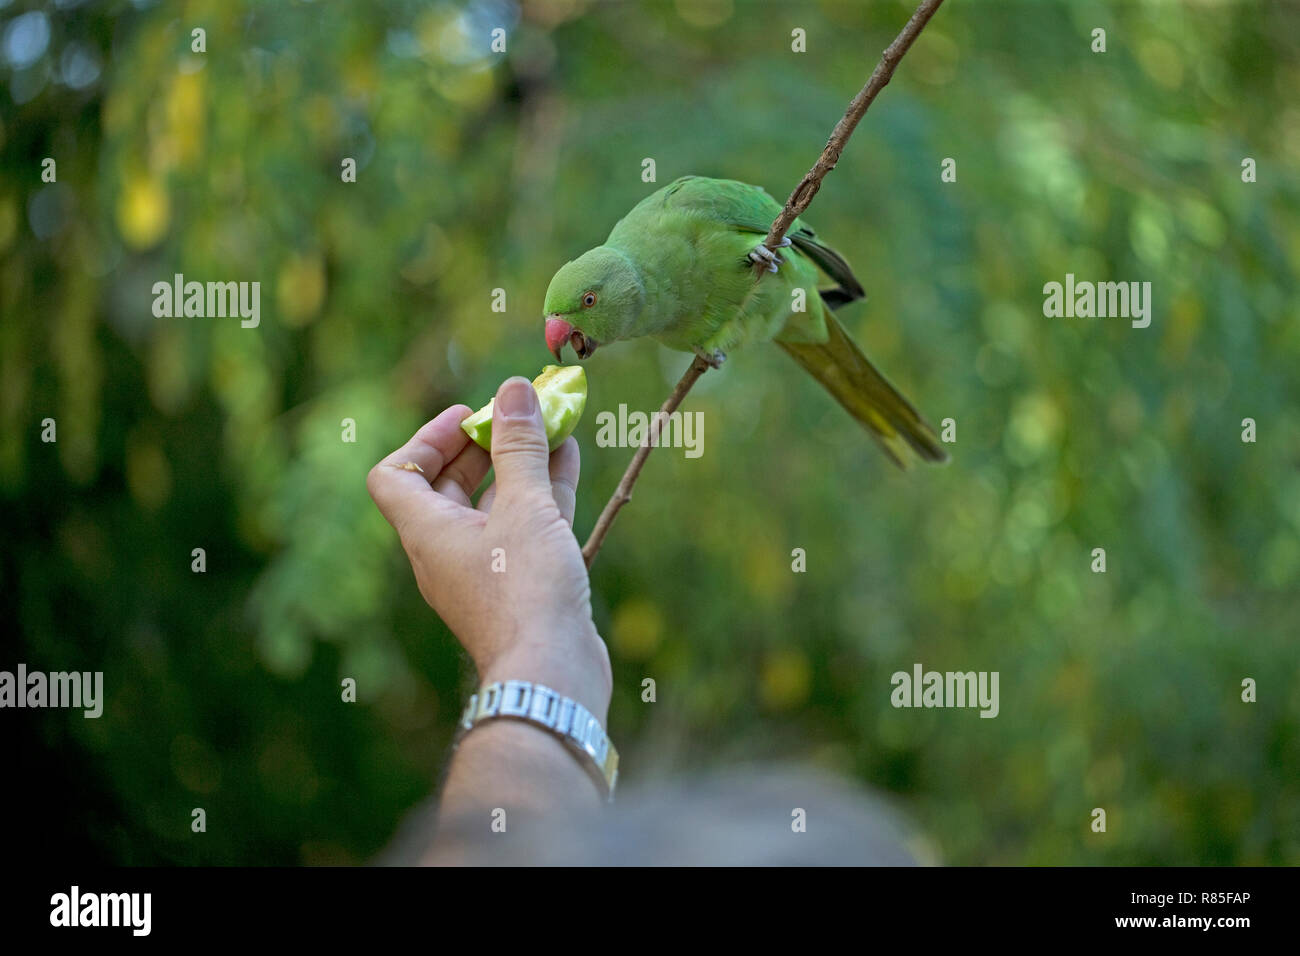 Roses In Garden: Rose Ringed Parakeets Uk Stock Photos & Rose Ringed